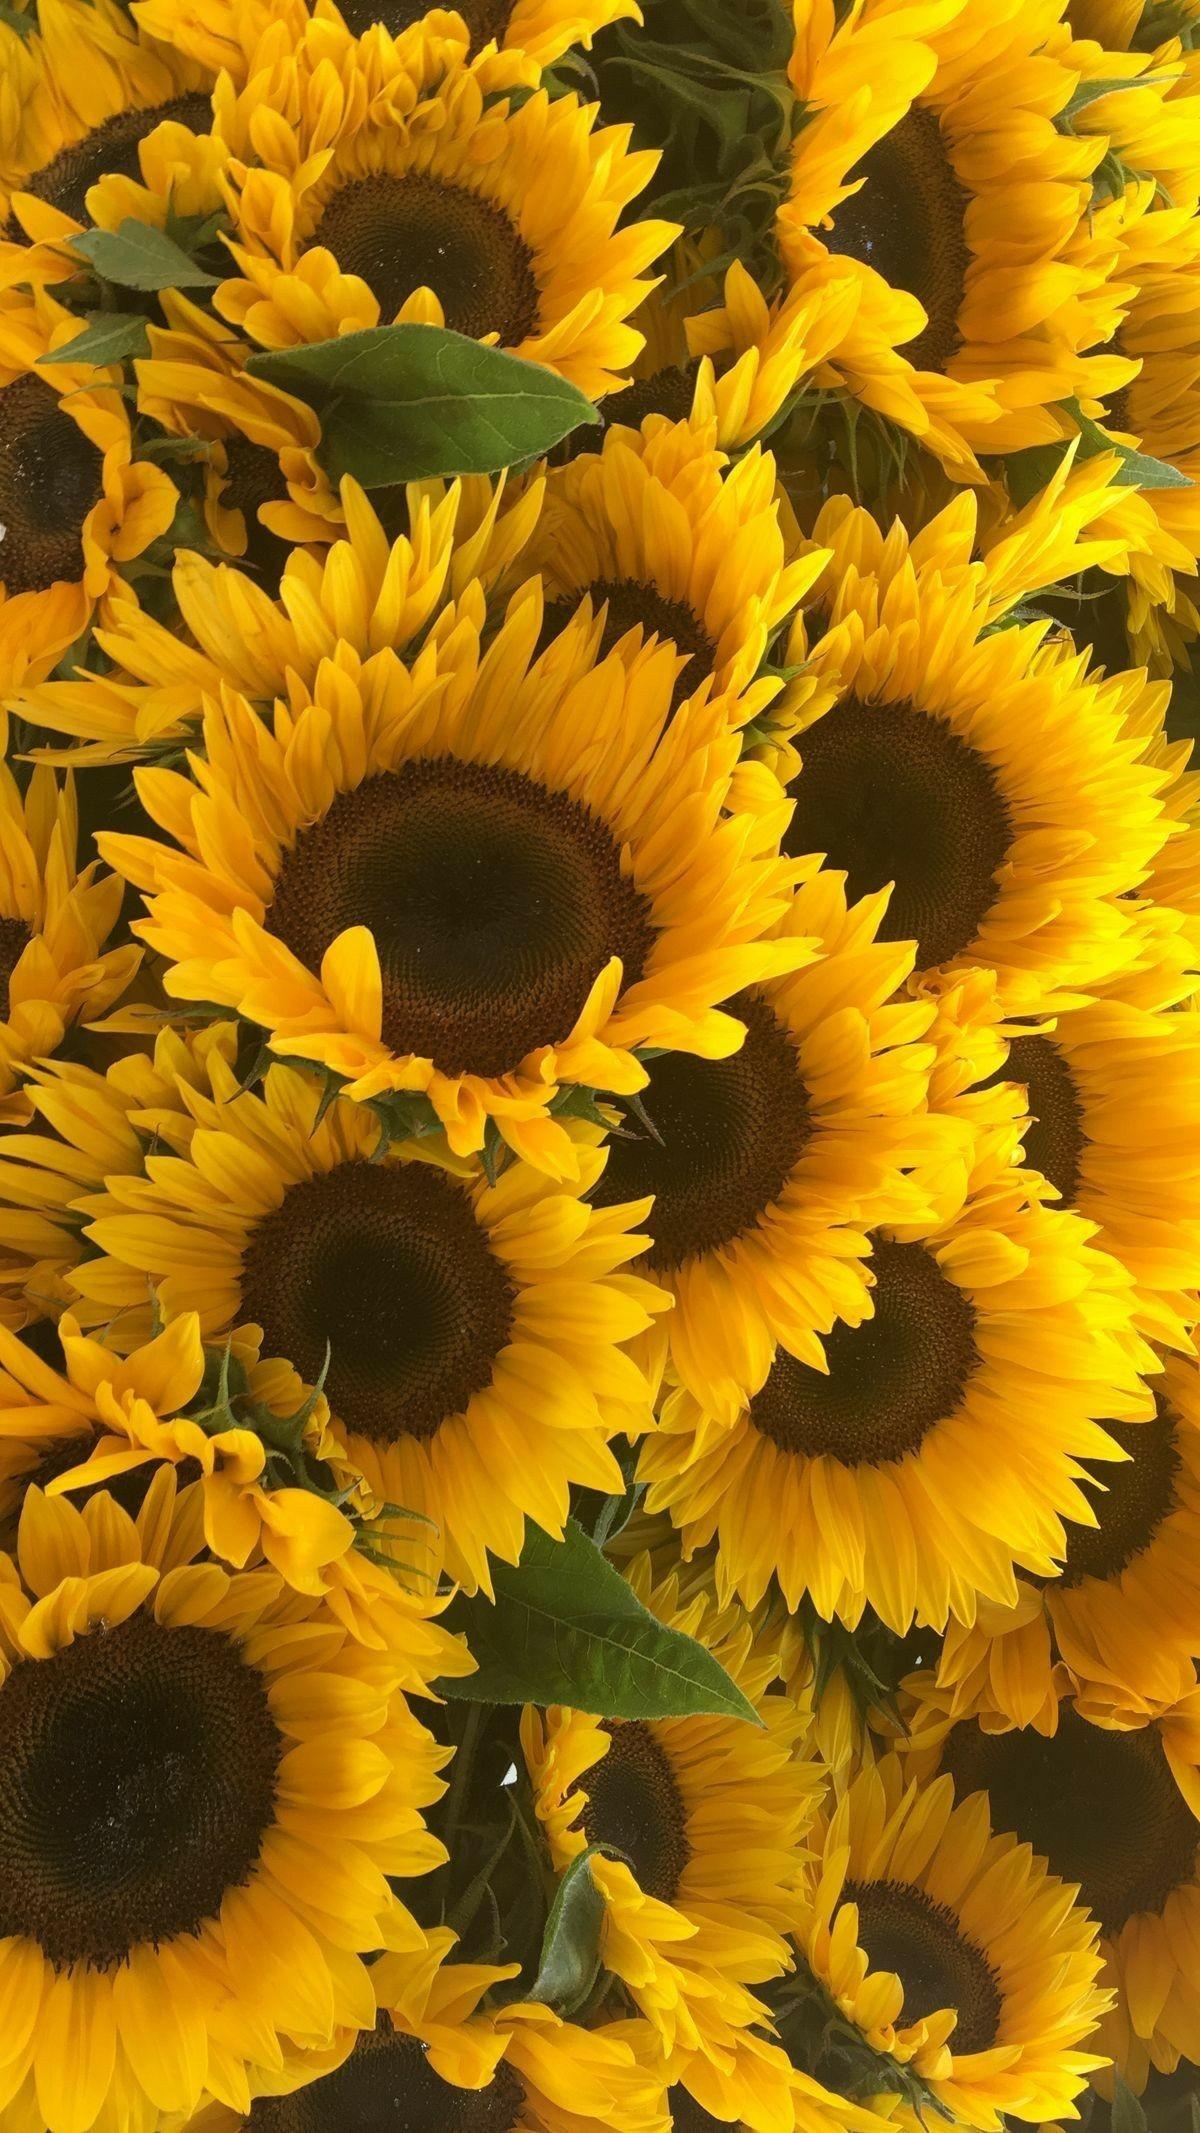 Sunflower Wallpaper Iphone X Hd Wallpapers backgrounds Download 1200x2133